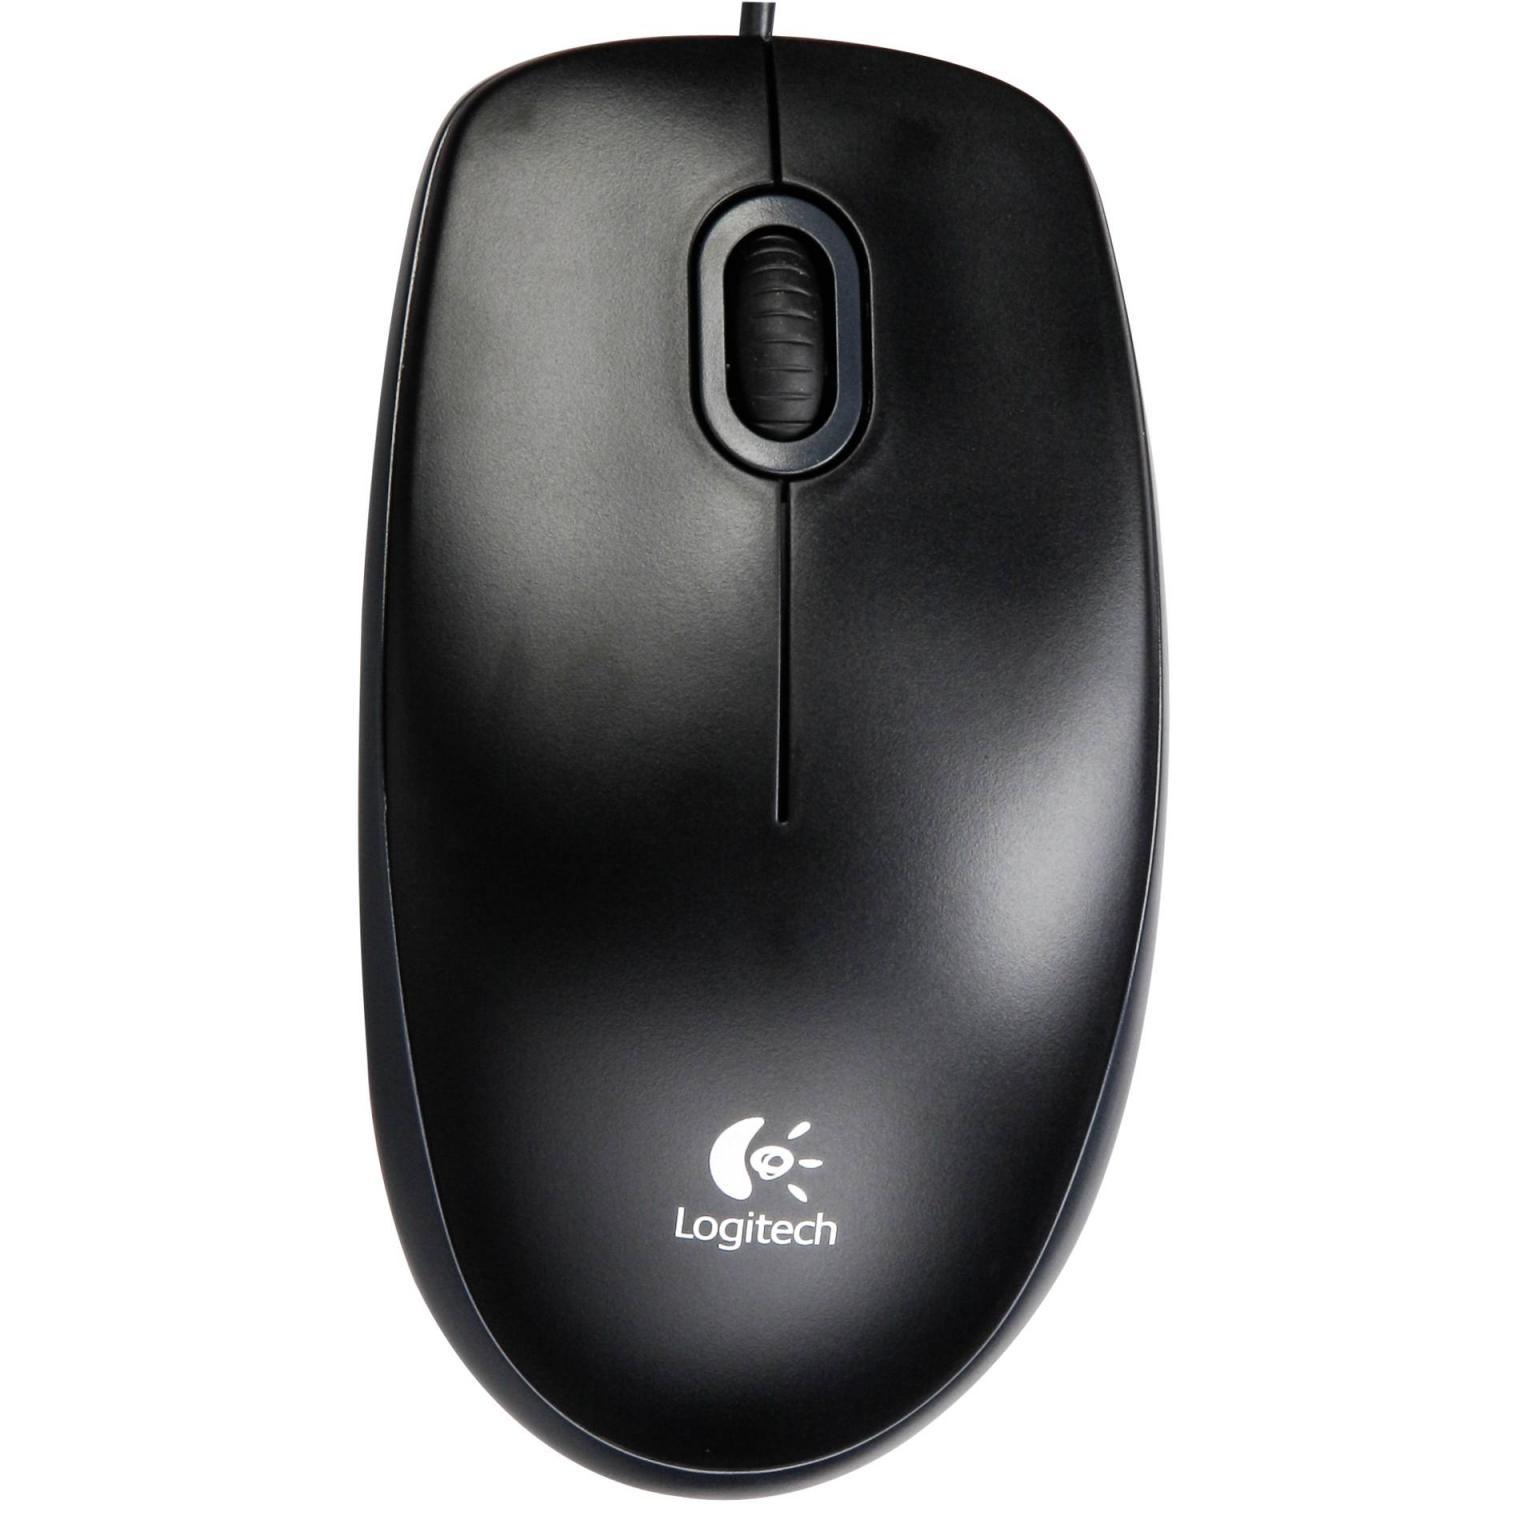 Logitech Maus B100 optical USB Mouse schwarz Kabel 1,80m USB 2.0